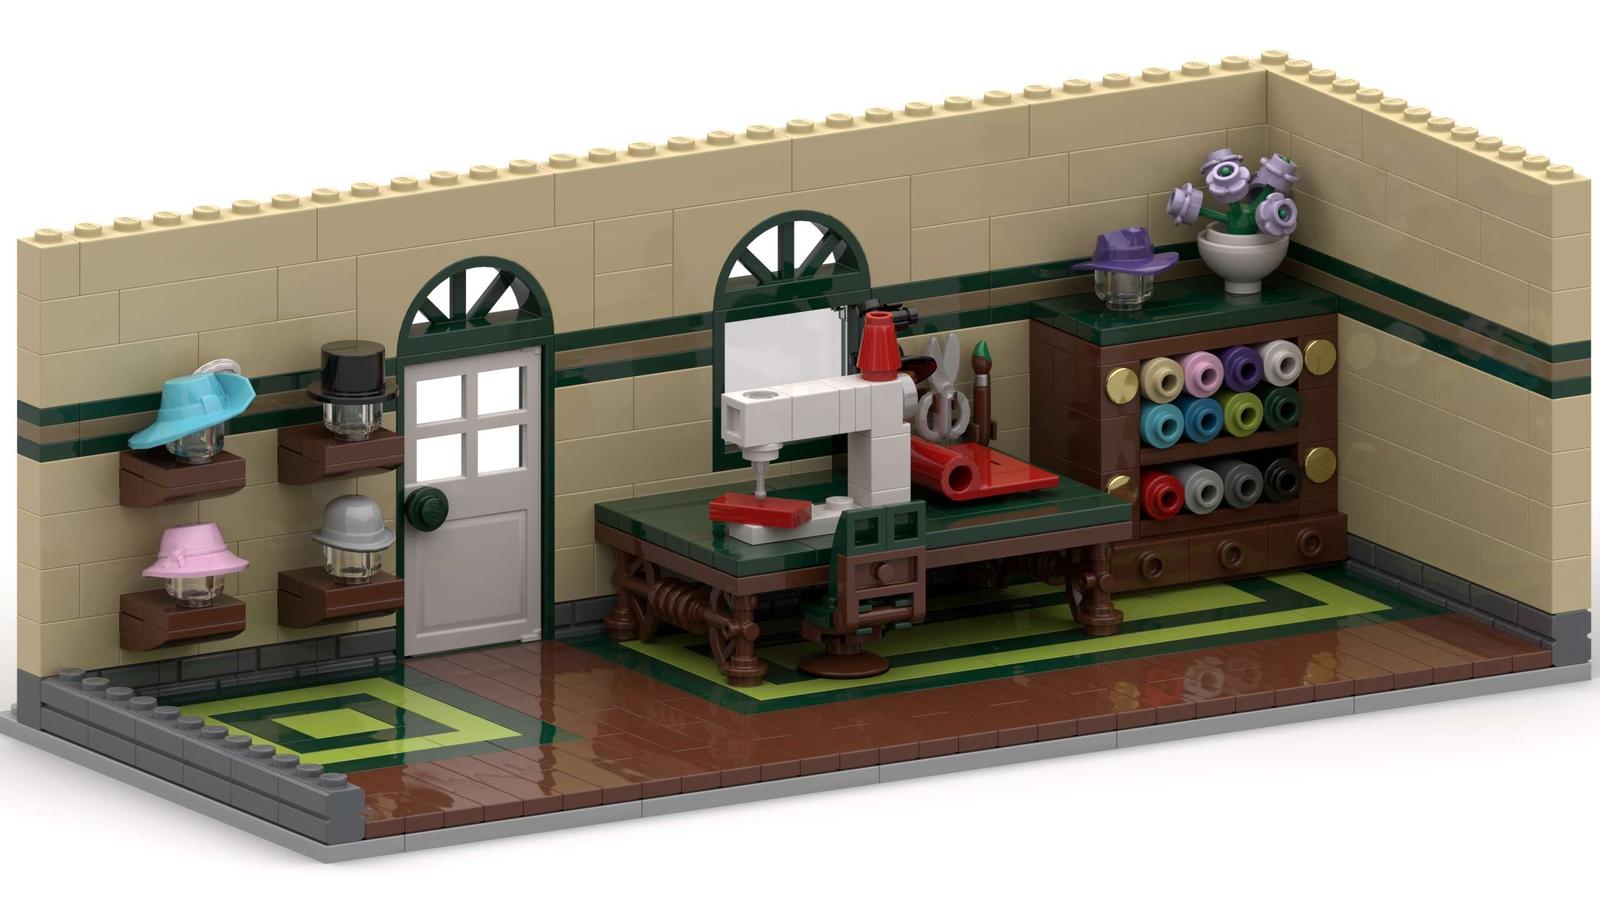 d6ba1af1c2e LEGO IDEAS - Design a virtual floor for the LEGO Tower game ...